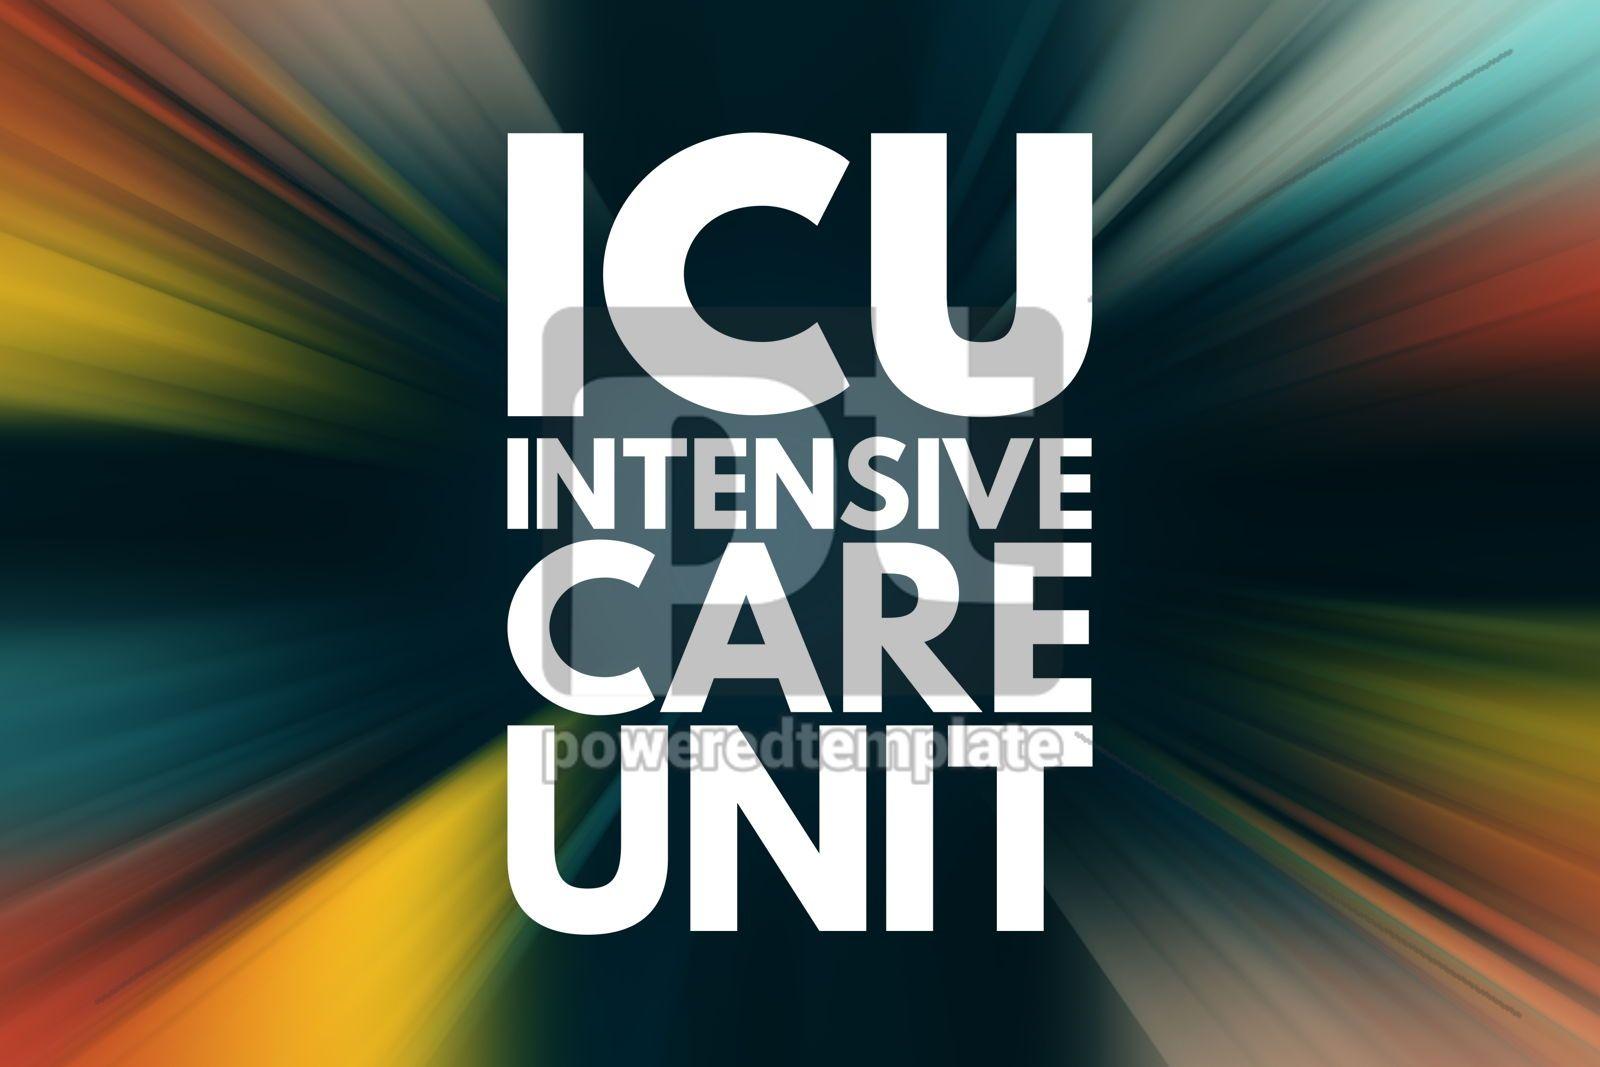 ICU - Intensive Care Unit acronym medical concept background, 15960, Business — PoweredTemplate.com